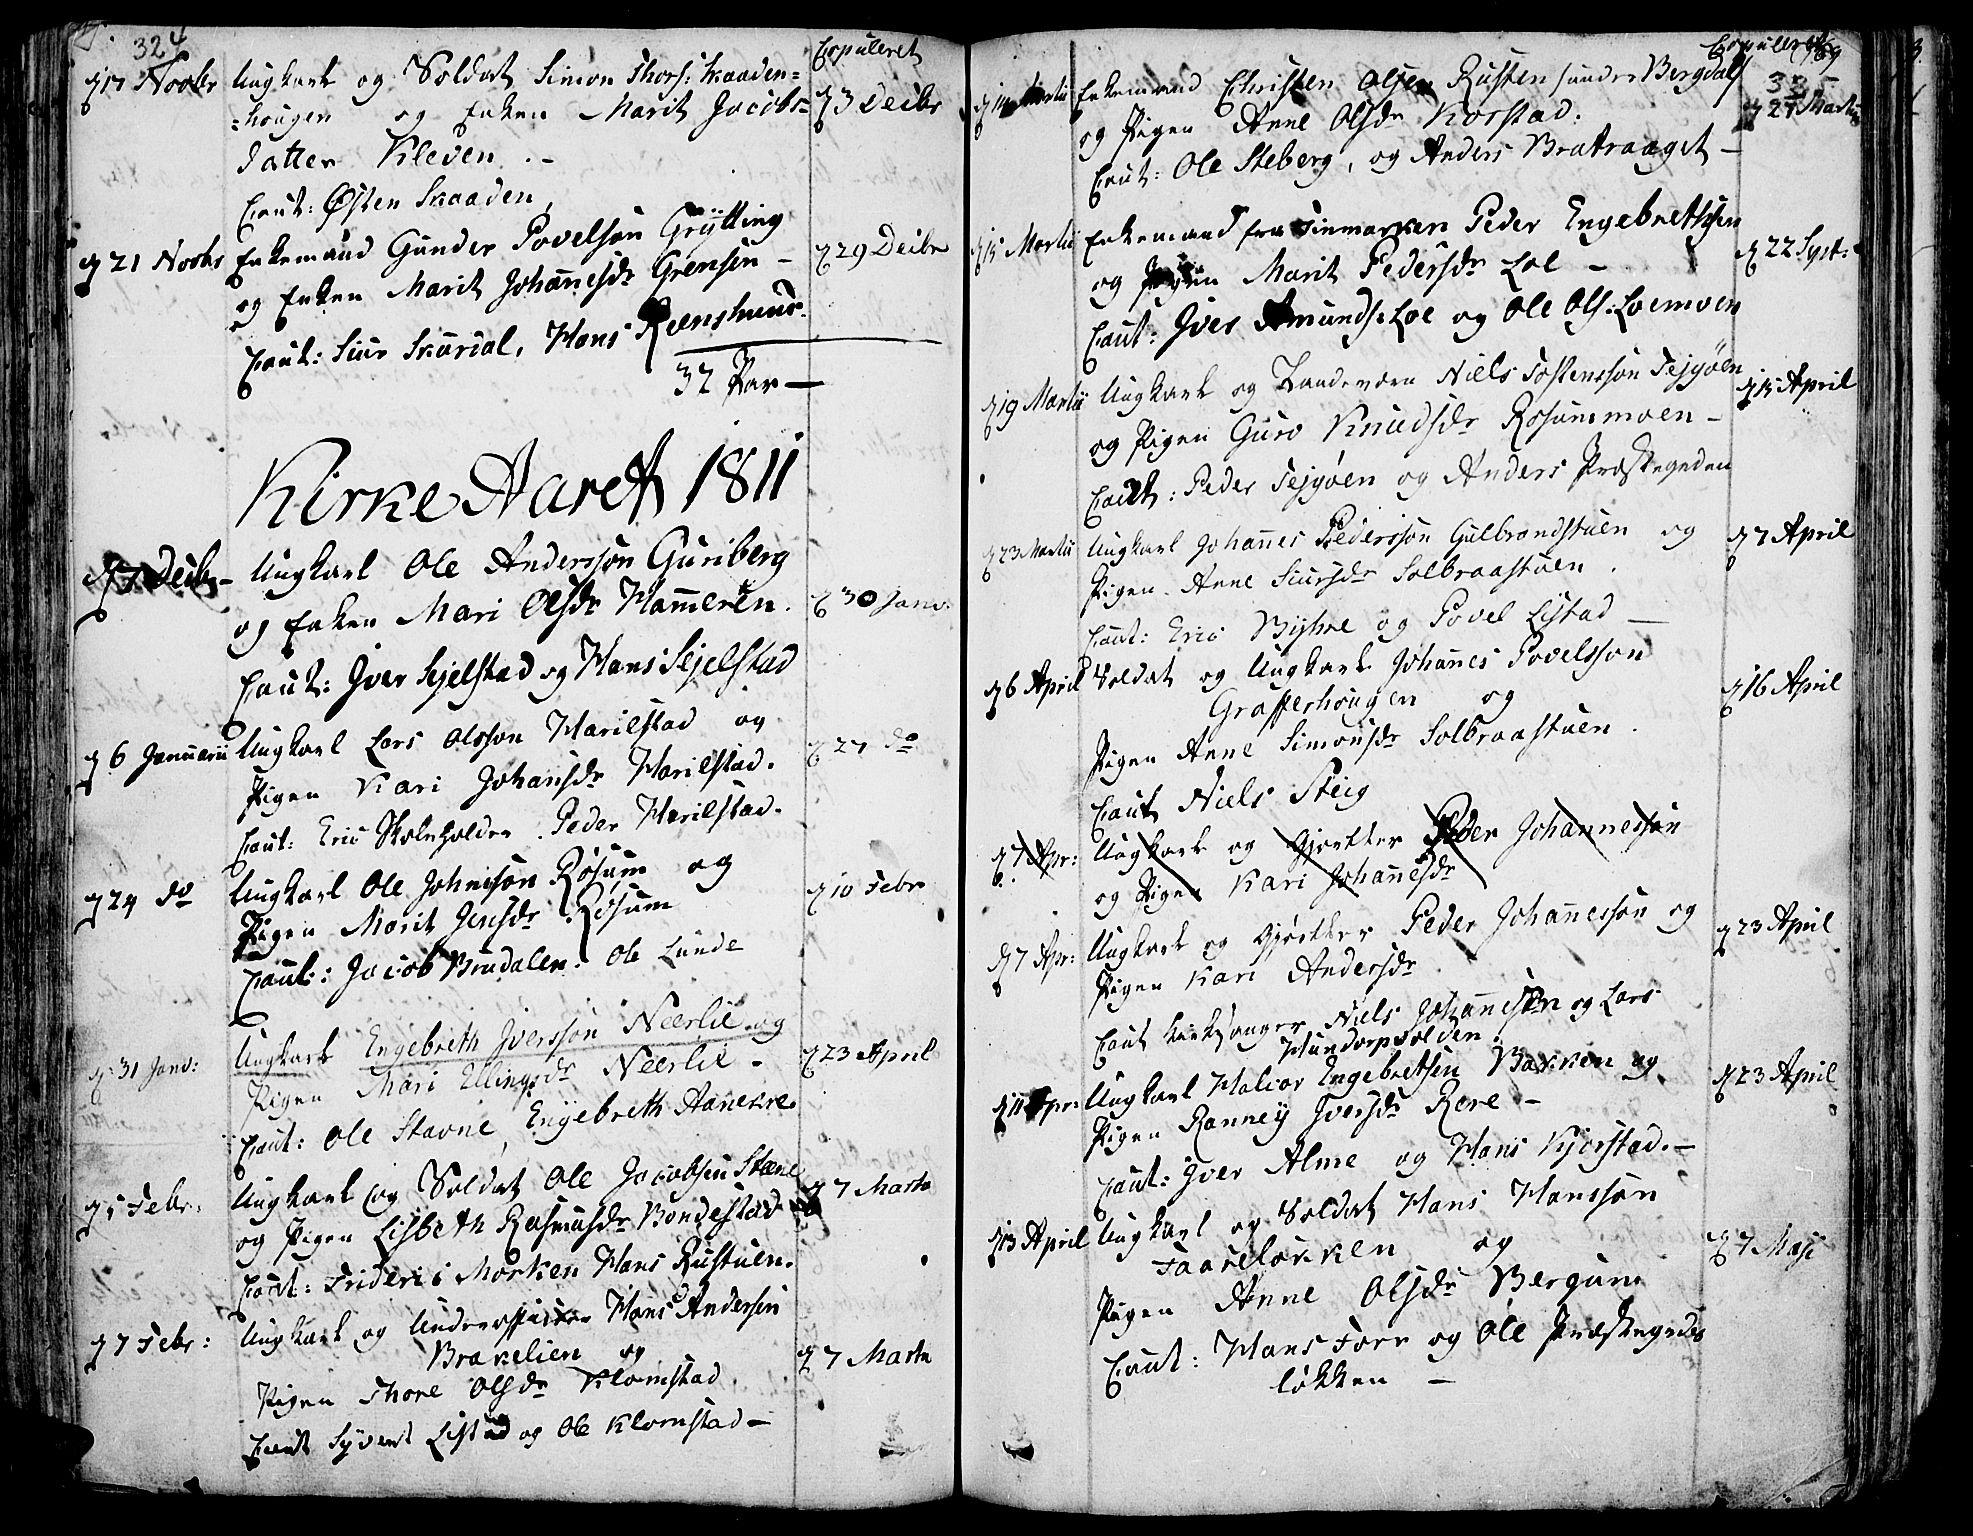 SAH, Fron prestekontor, H/Ha/Haa/L0001: Ministerialbok nr. 1, 1799-1816, s. 324-325